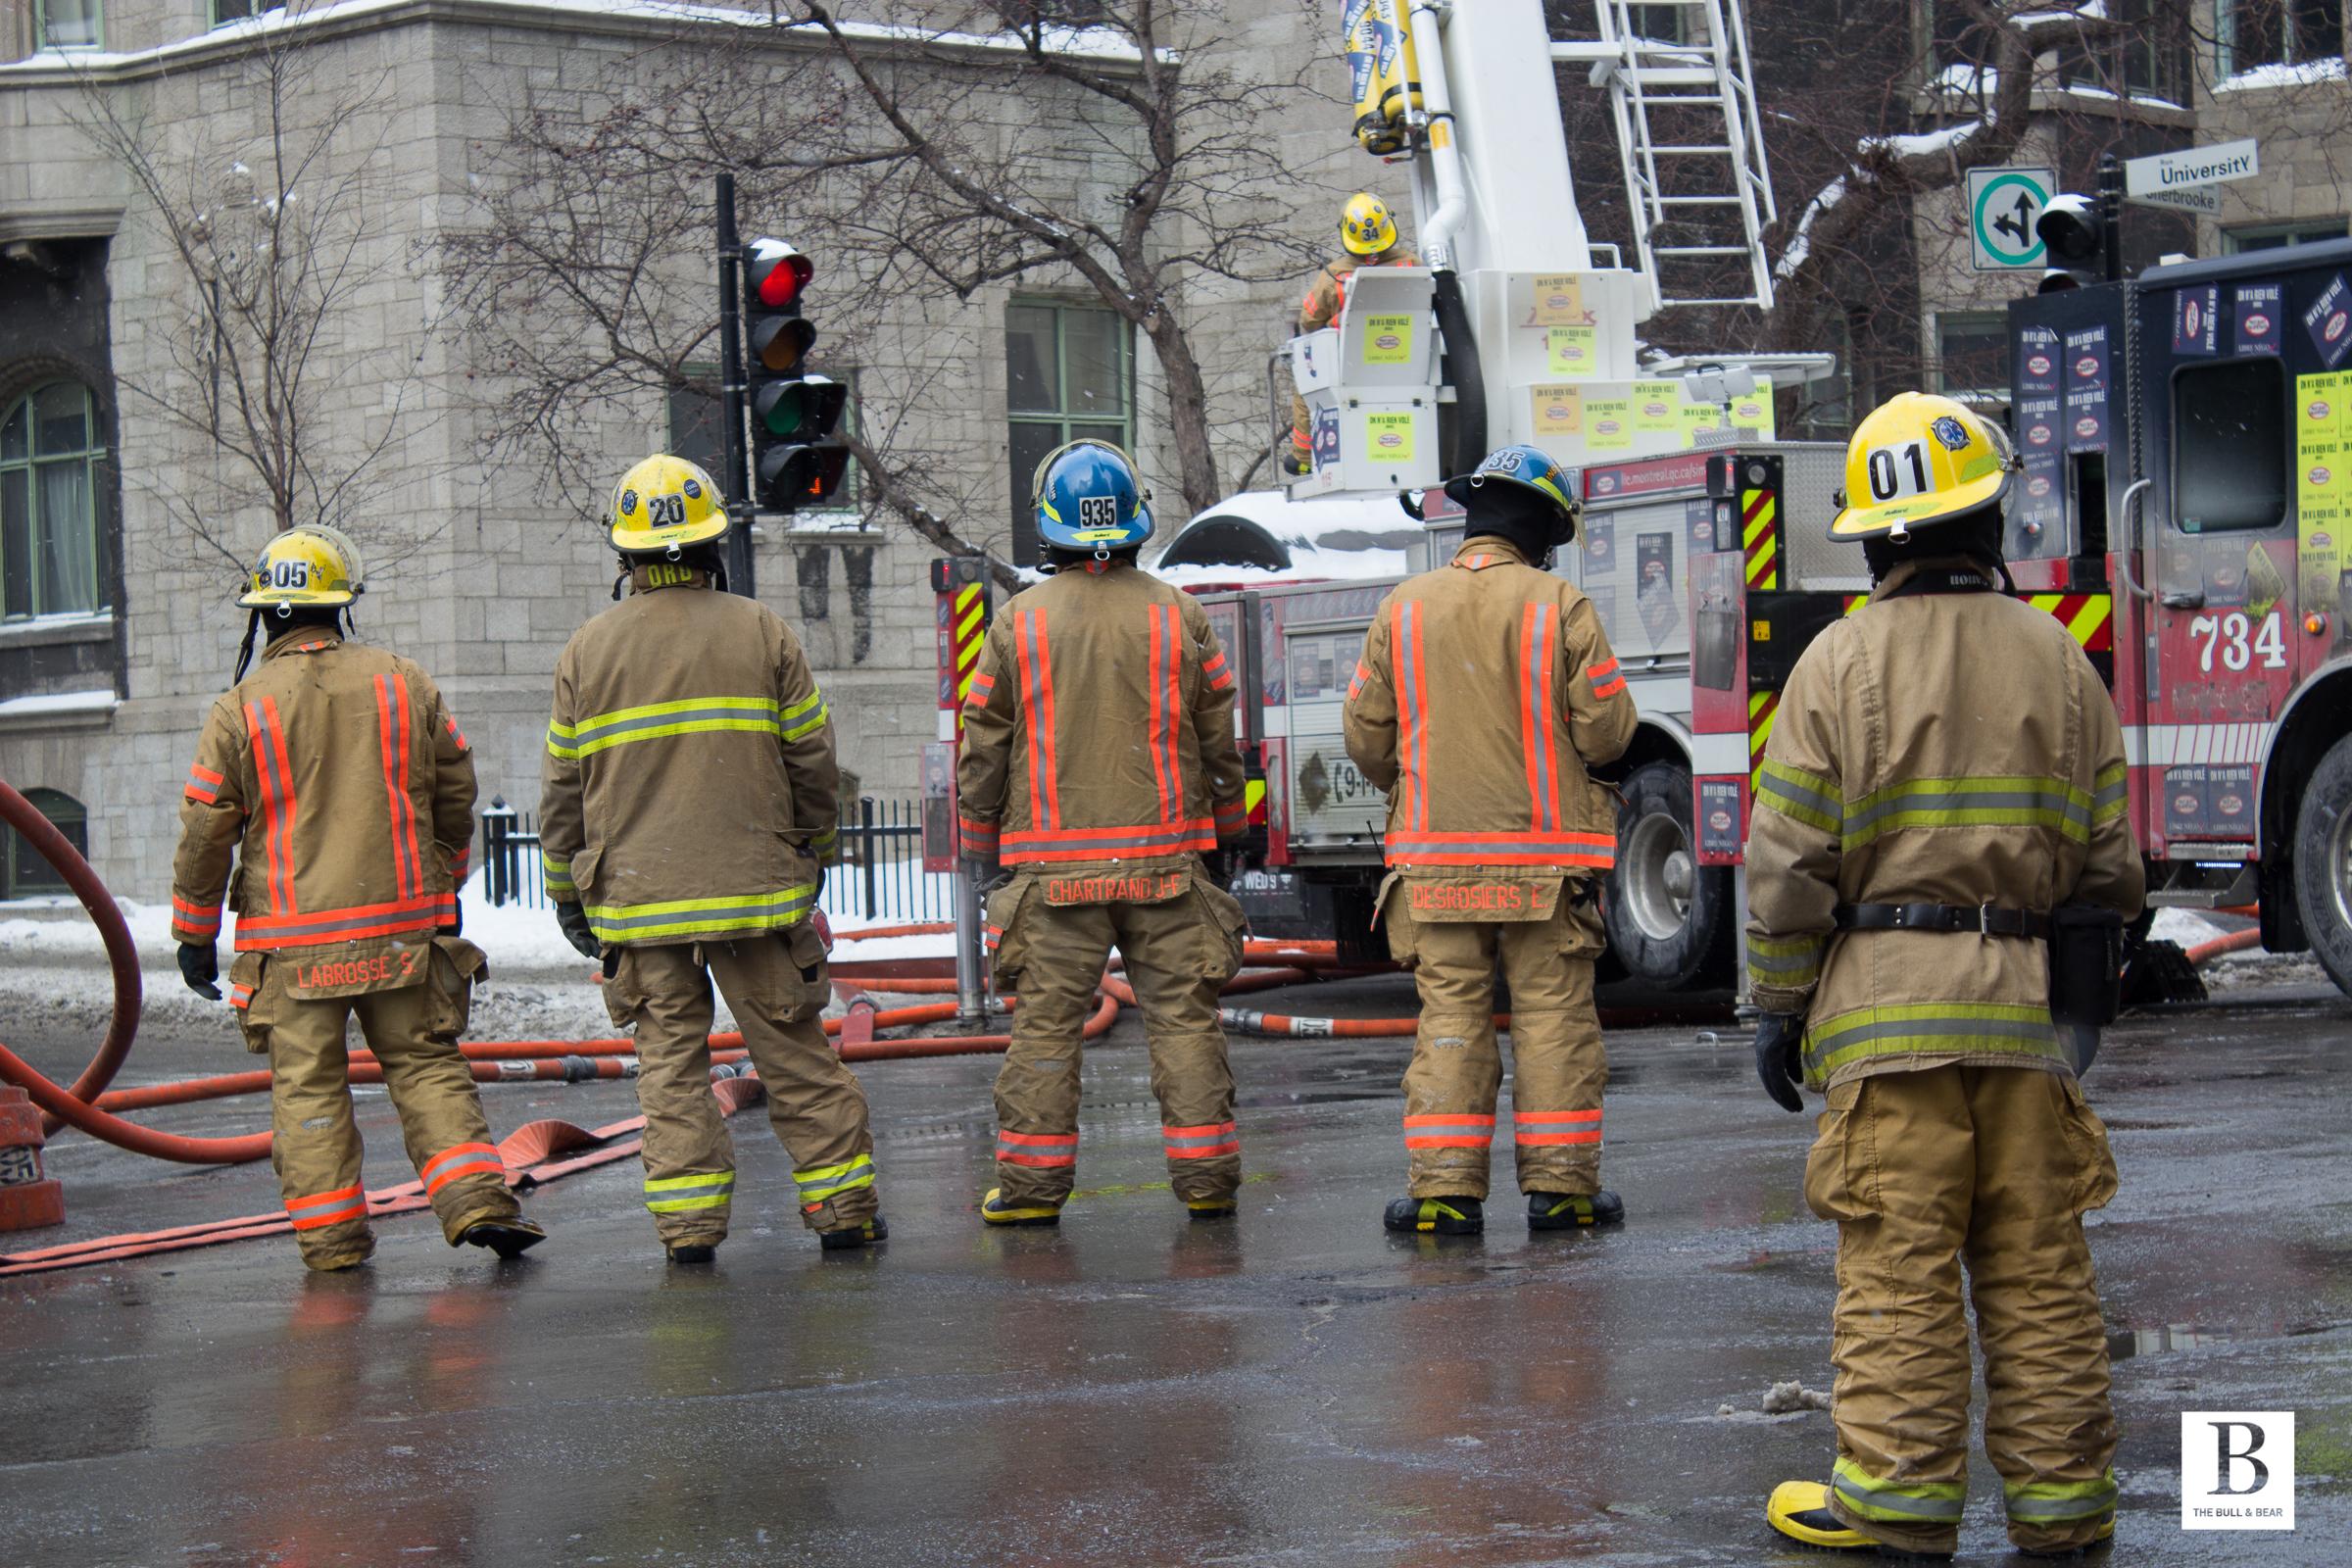 Feb 10th, 2015: Fire at Royal Victoria College